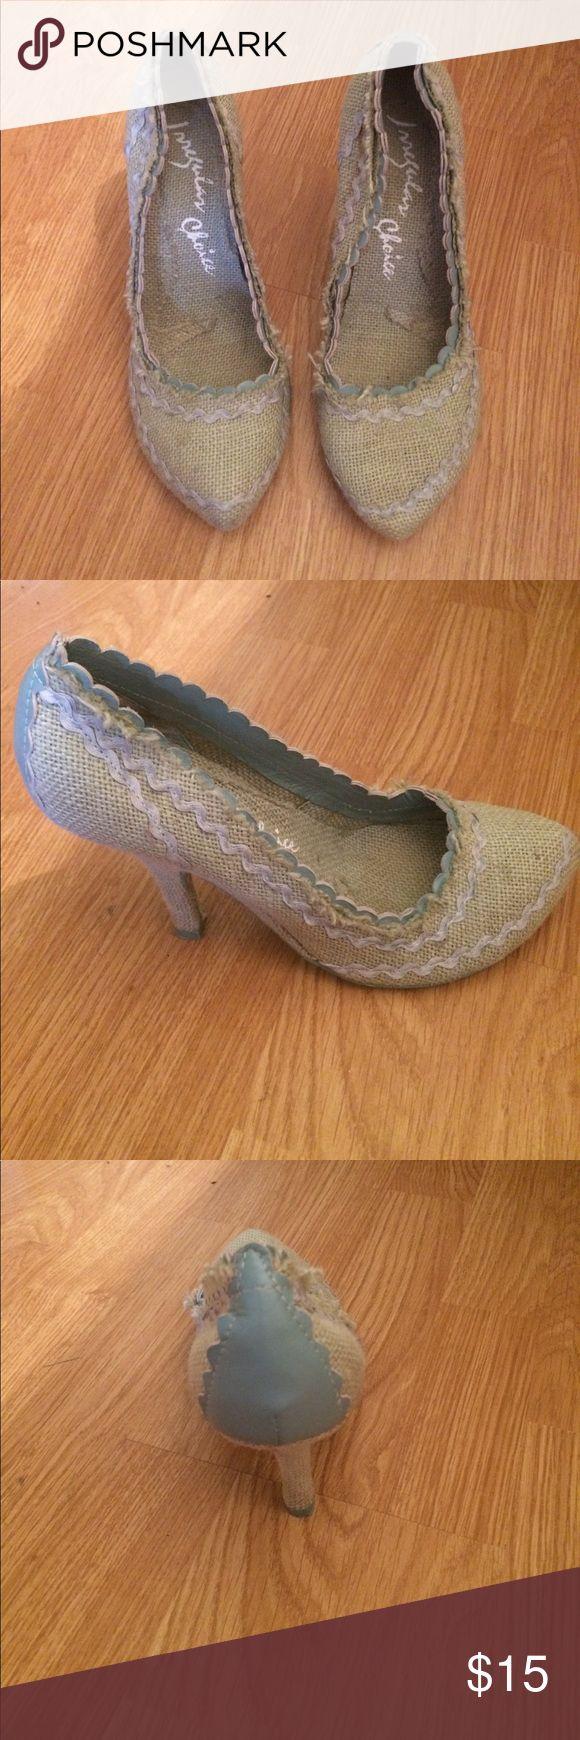 Irregular Choice Heels Used Irregular Choice Heels. Size 40. Raw Hem, scalloped trim. Signs of wear but still adorable! irregular choice Shoes Heels